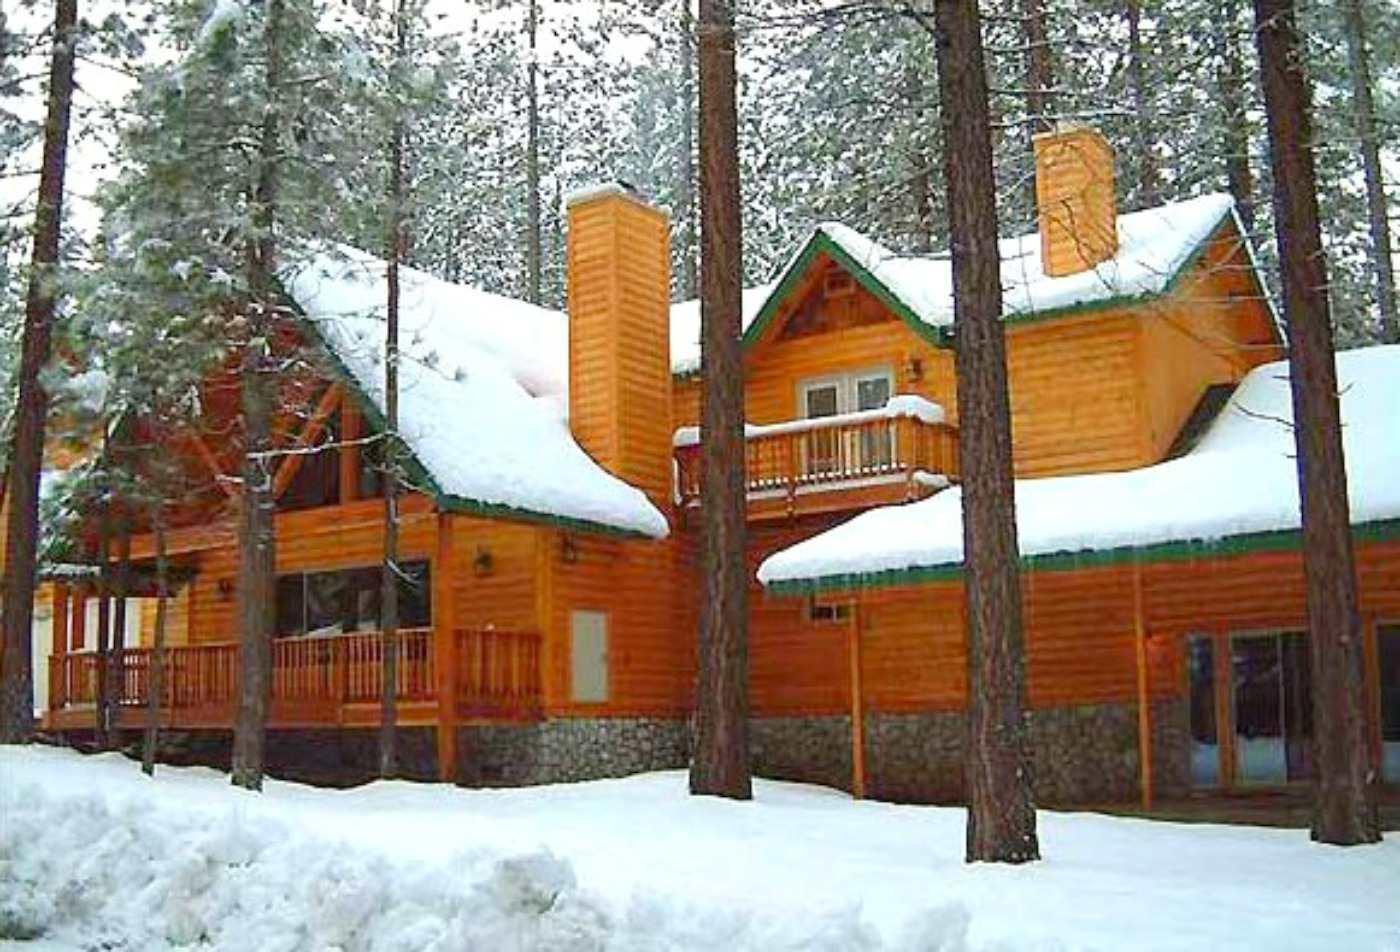 Top 10 Christmas Vacation Rental Destinations